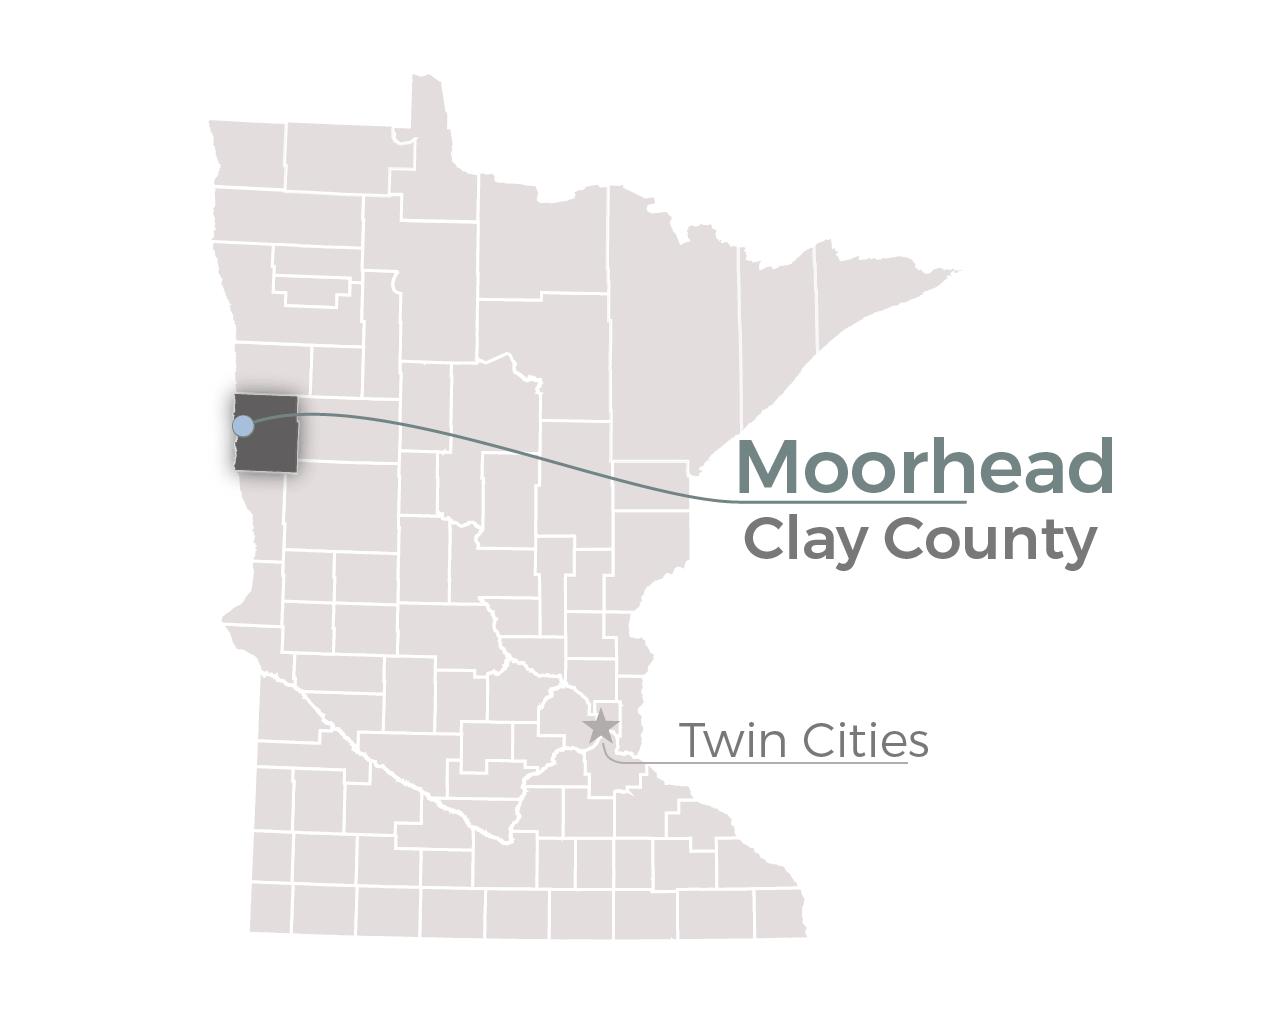 Moorhead, Minn.